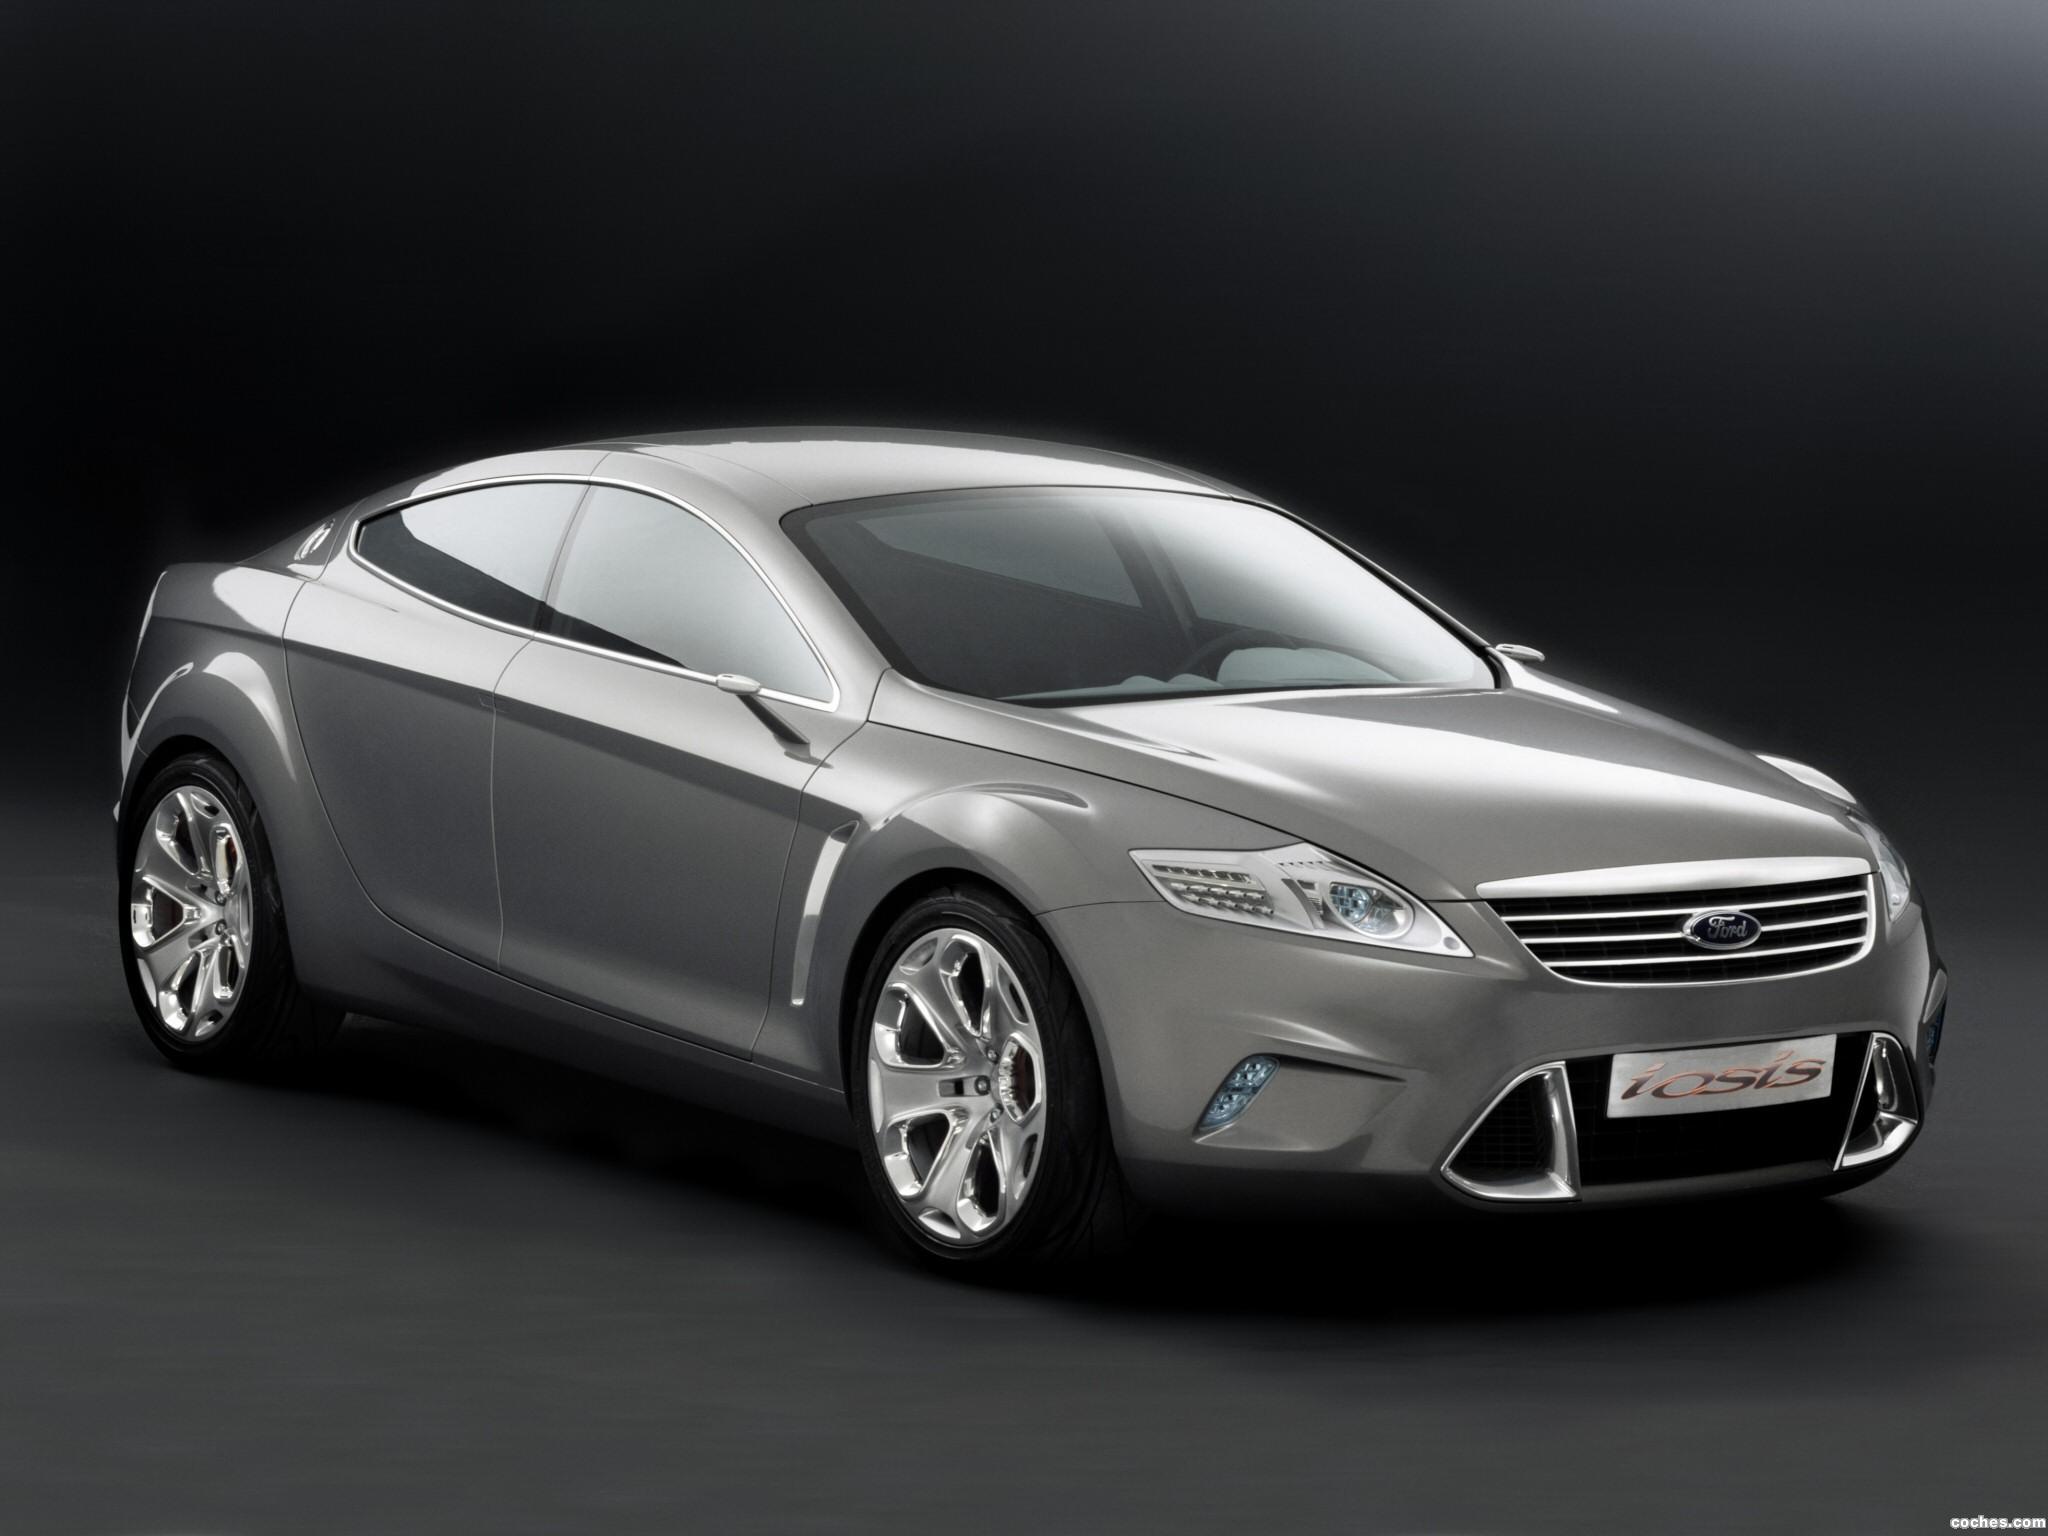 Foto 0 de Ford Iosis Concept 2005